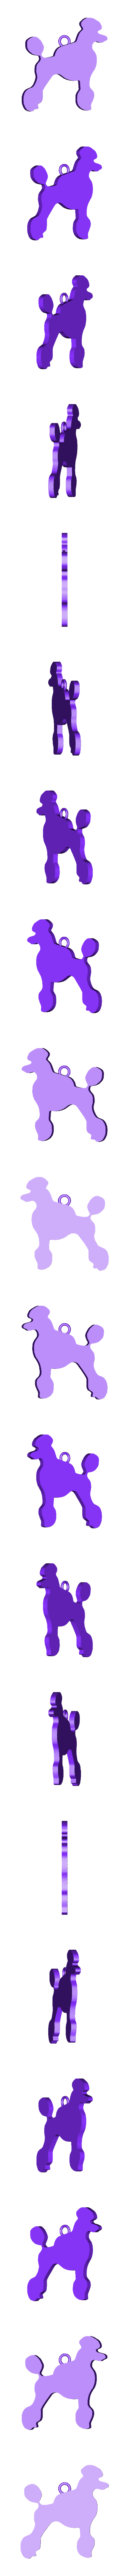 36.stl Download STL file Dogs • 3D printing object, GENNADI3313